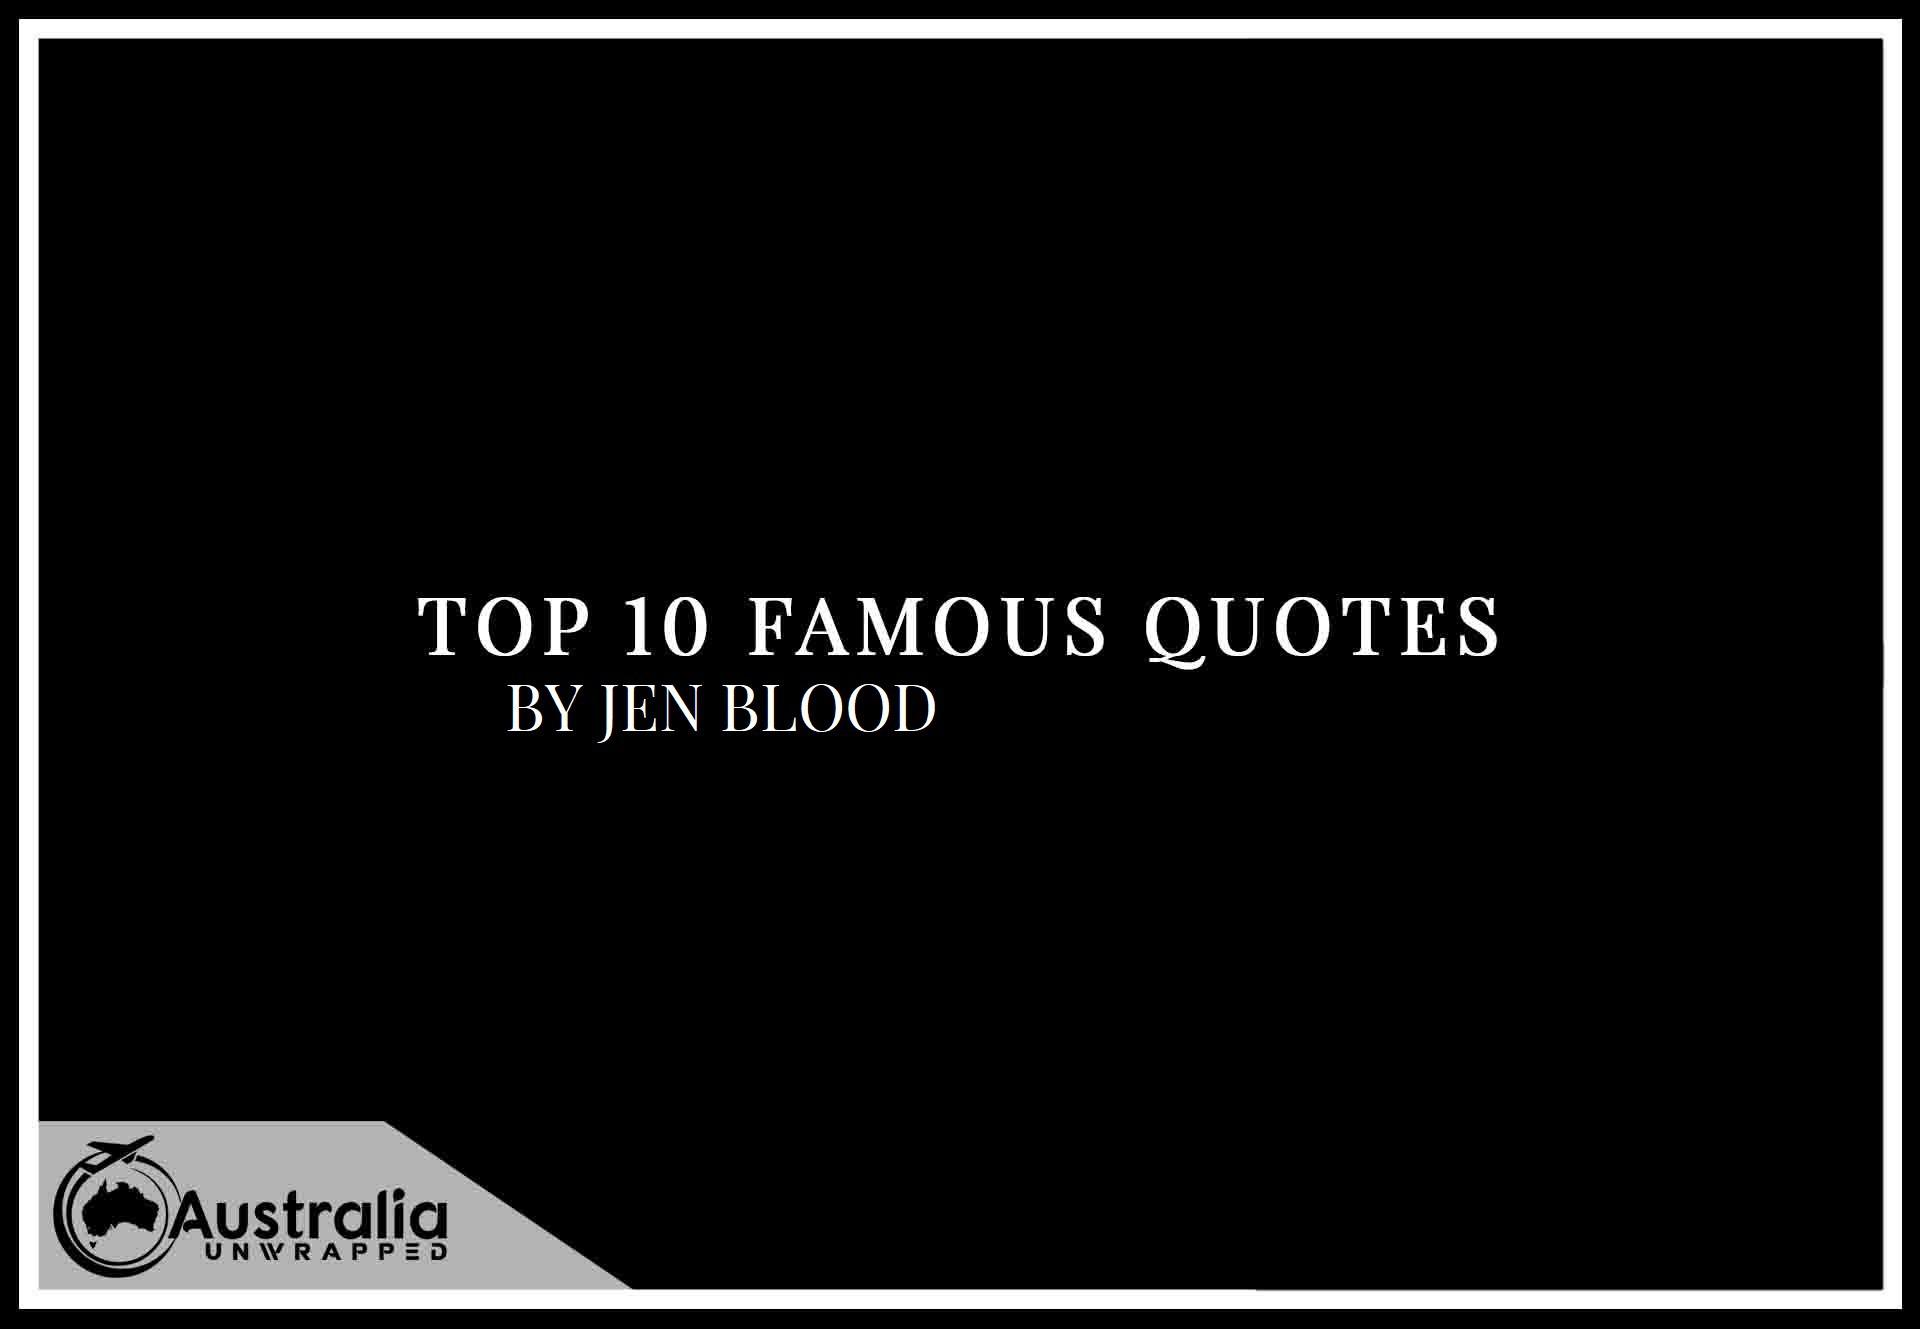 Top 10 Famous Quotes by Author Jen Blood